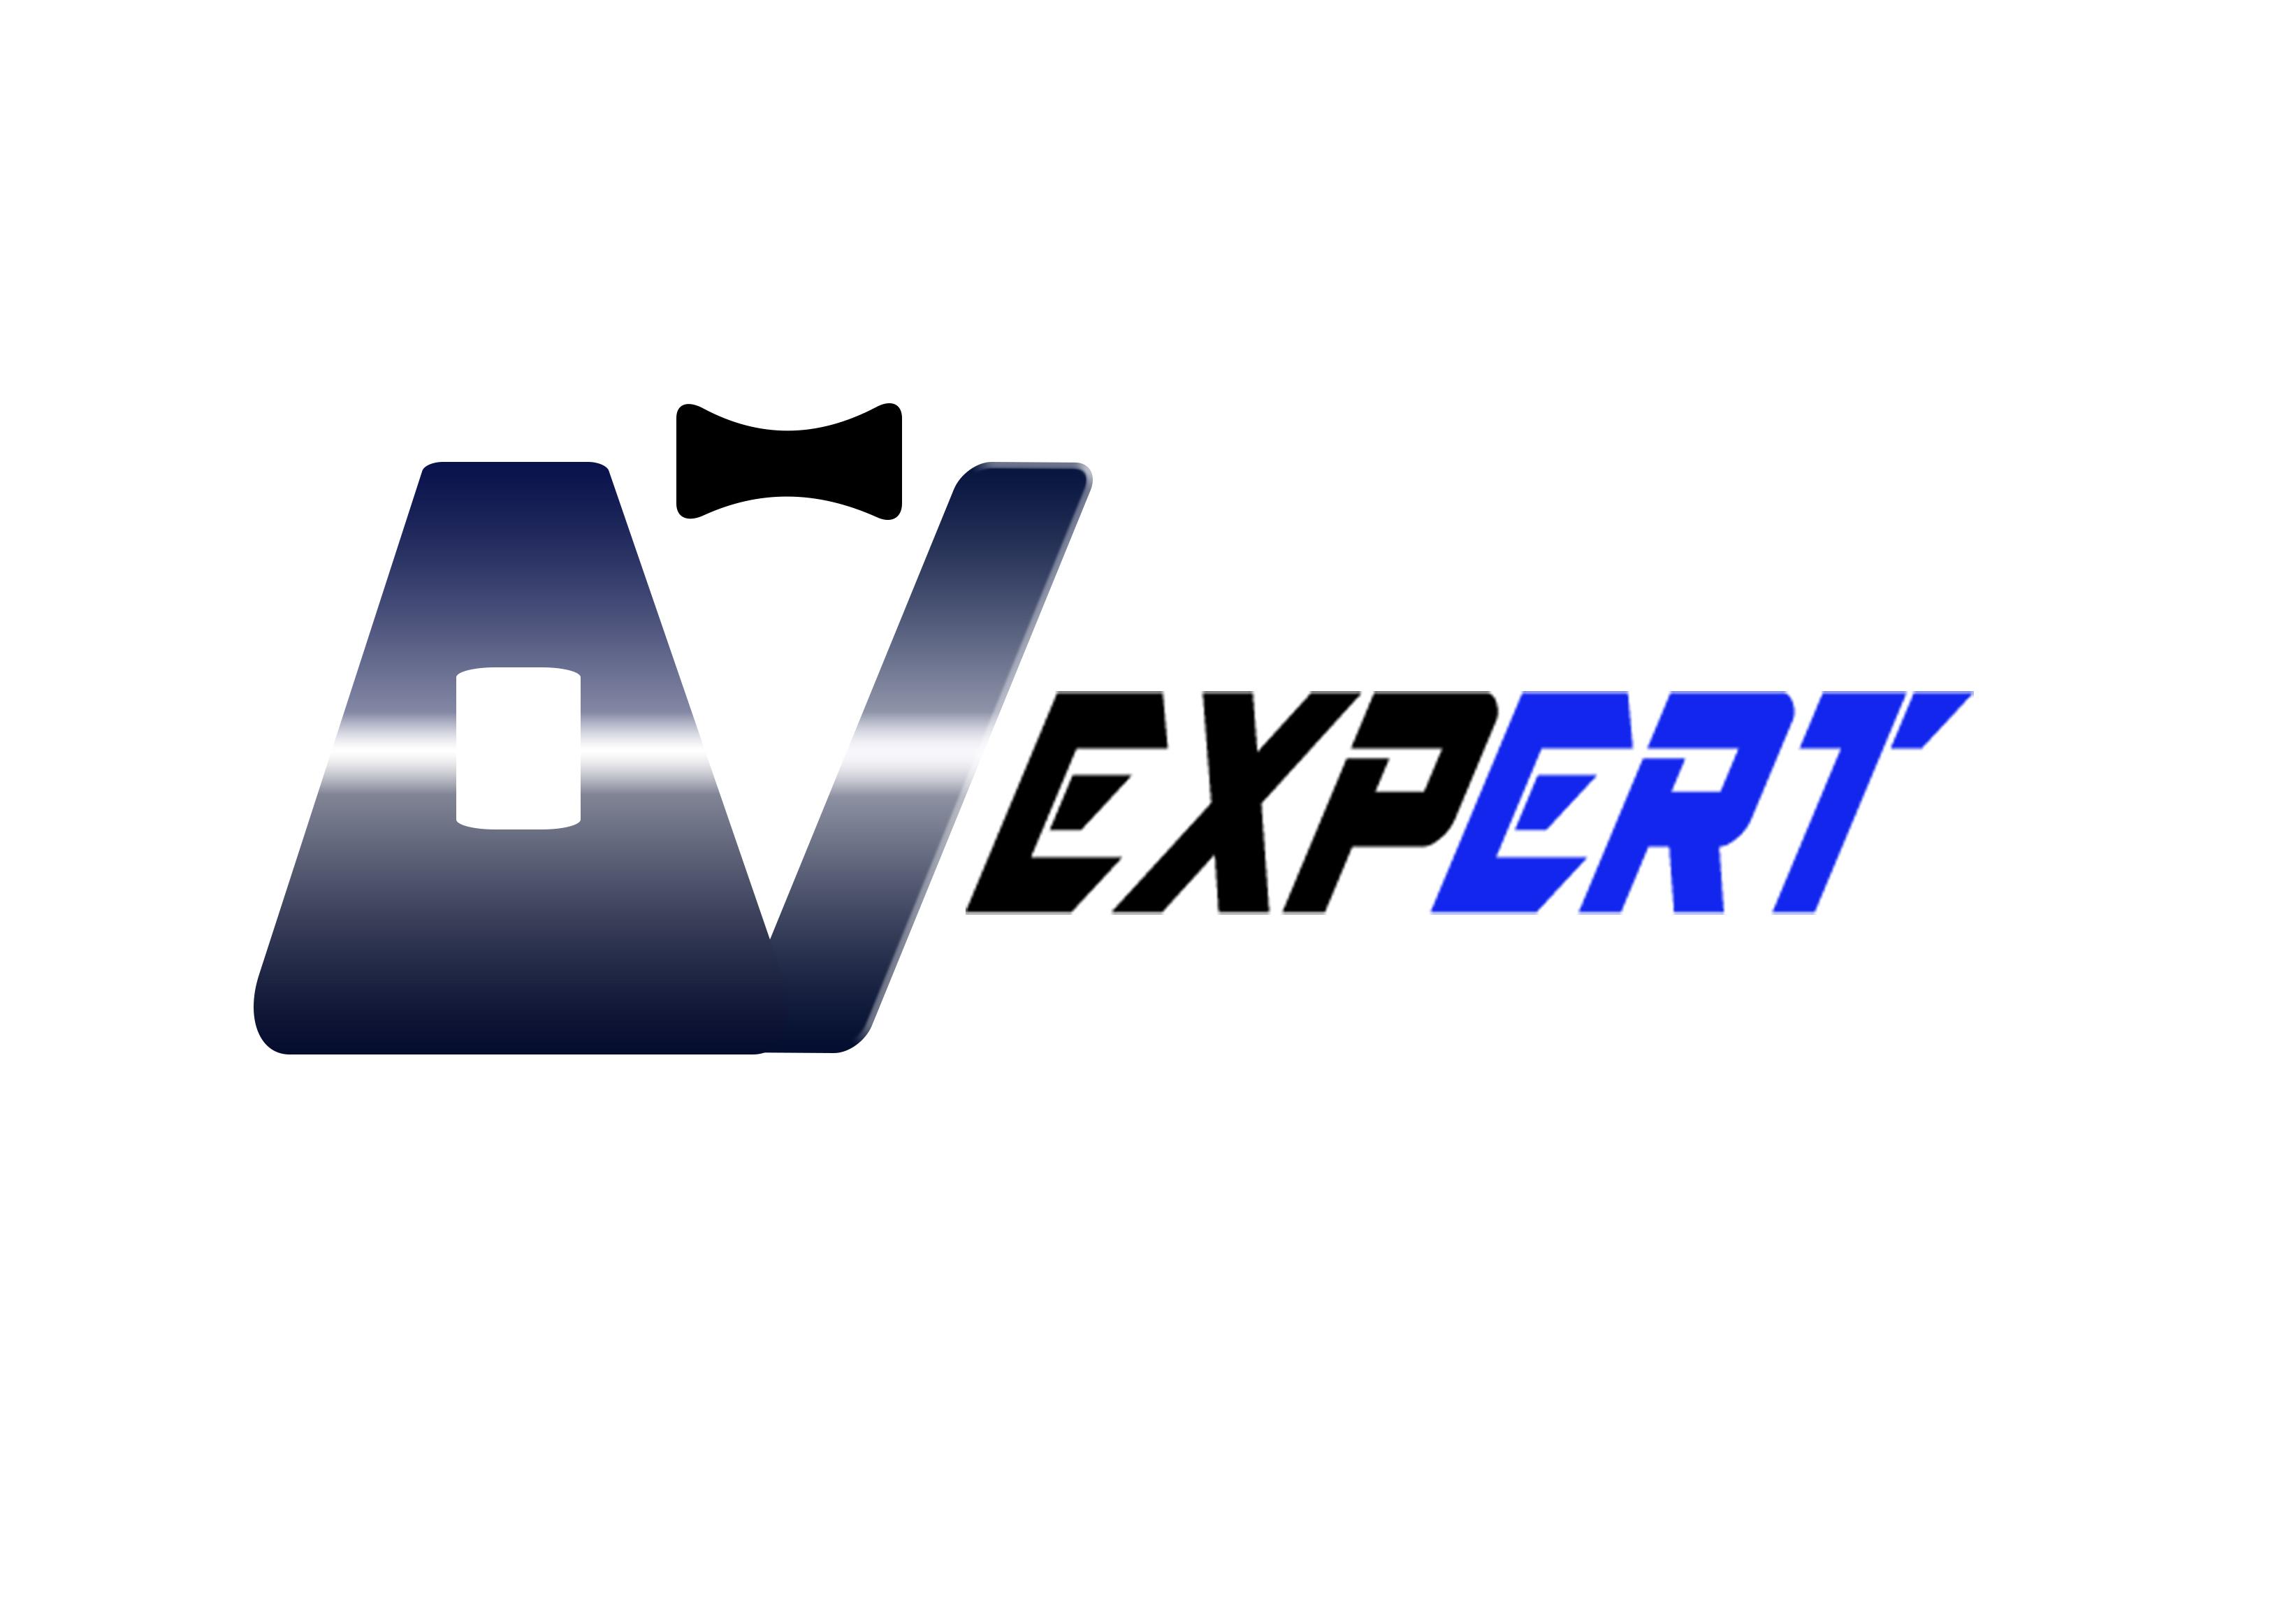 Создание логотипа, фирстиля фото f_5805c641ca909548.jpg